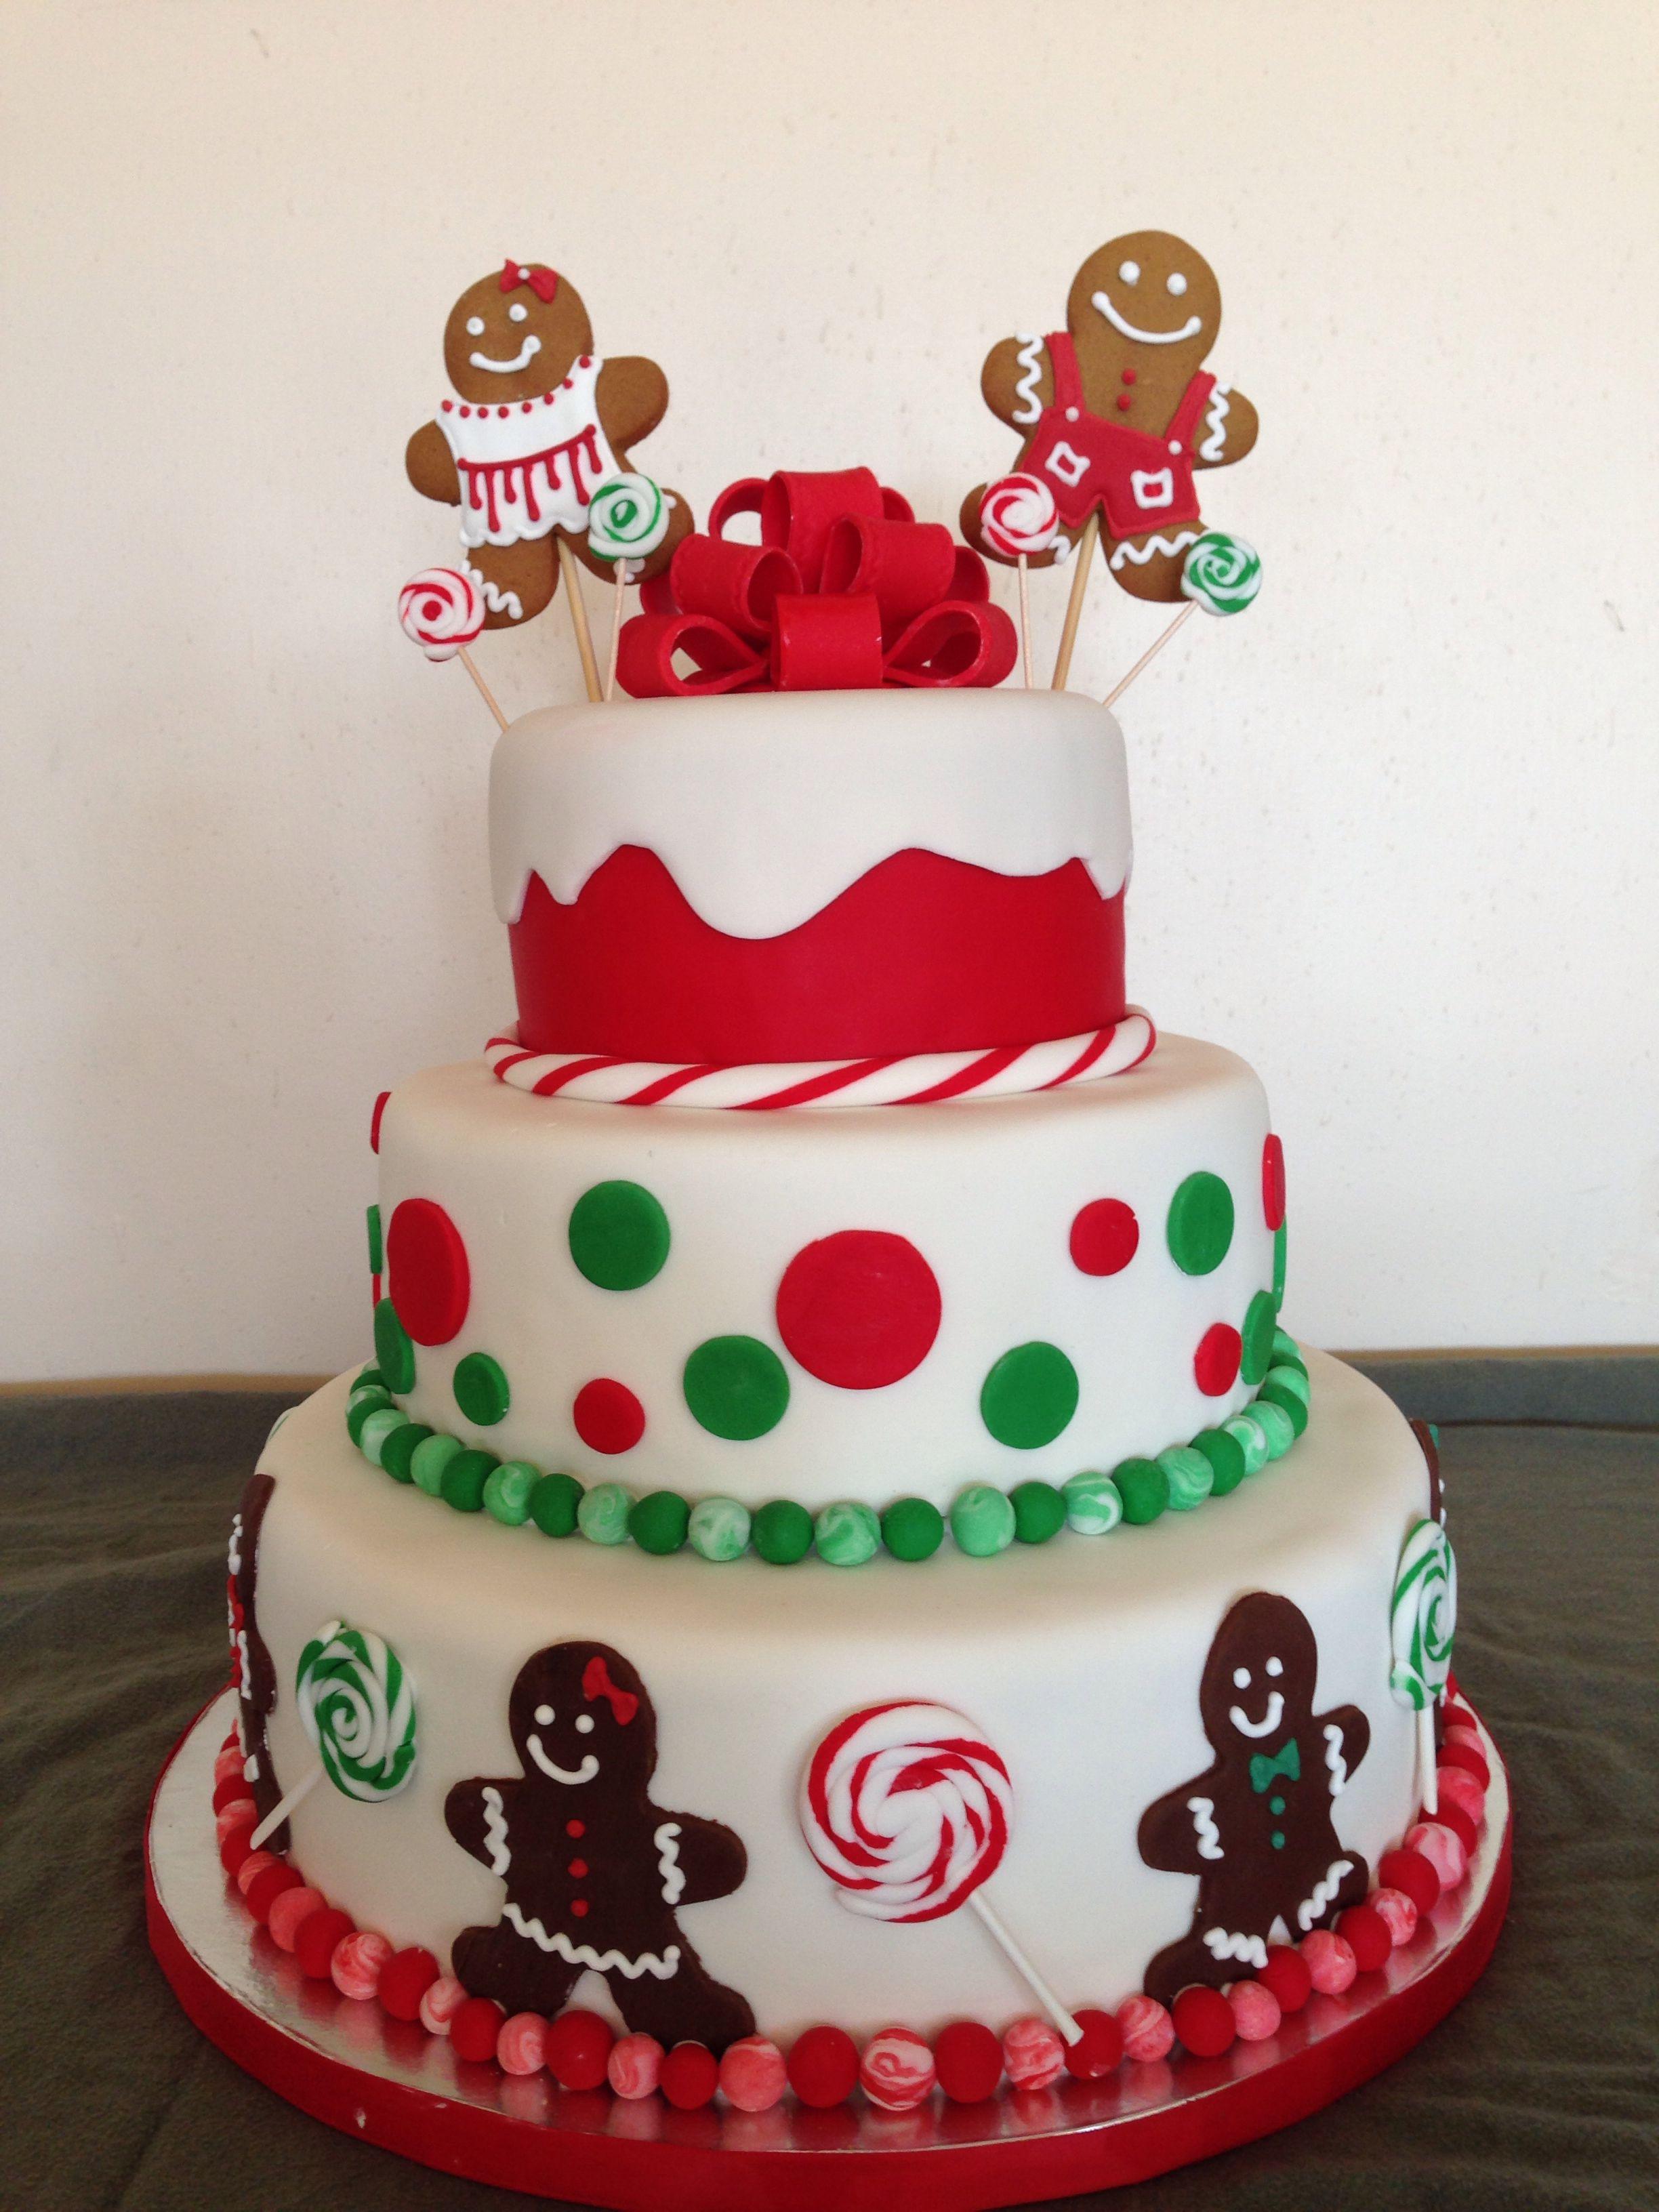 Fun, festive, Christmas birthday cake! Gingerbread